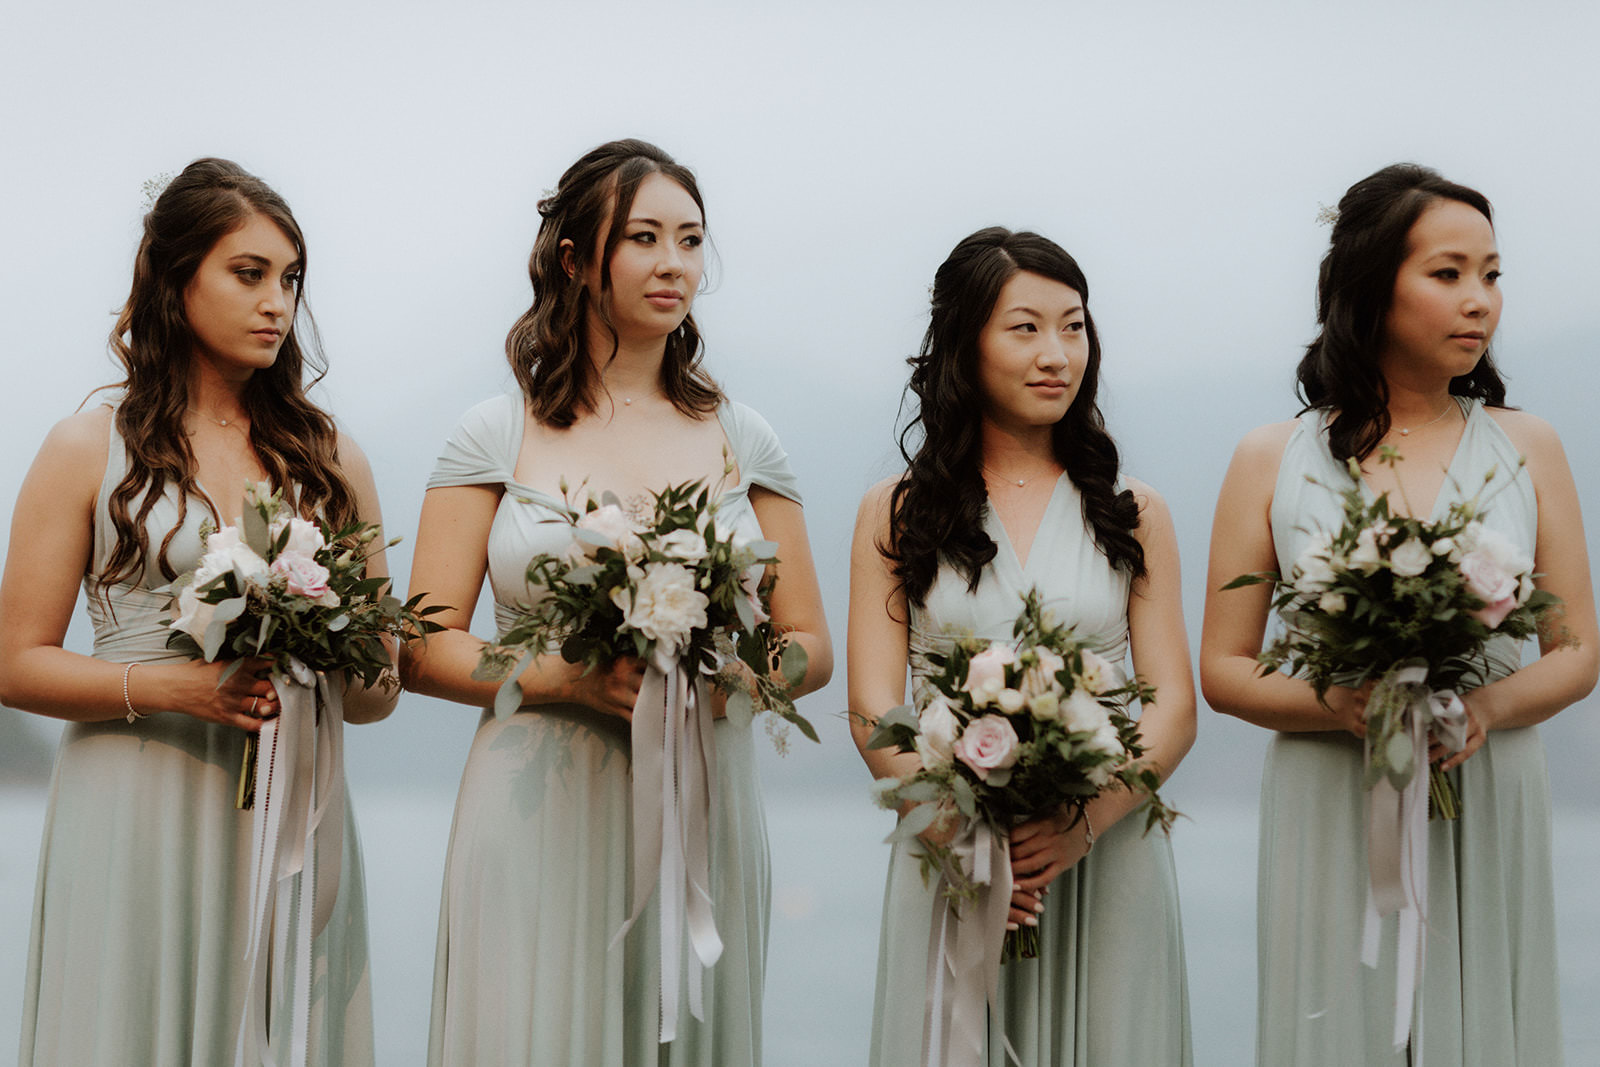 Pretty Bridesmaids at Rustic Anvil Island Wedding